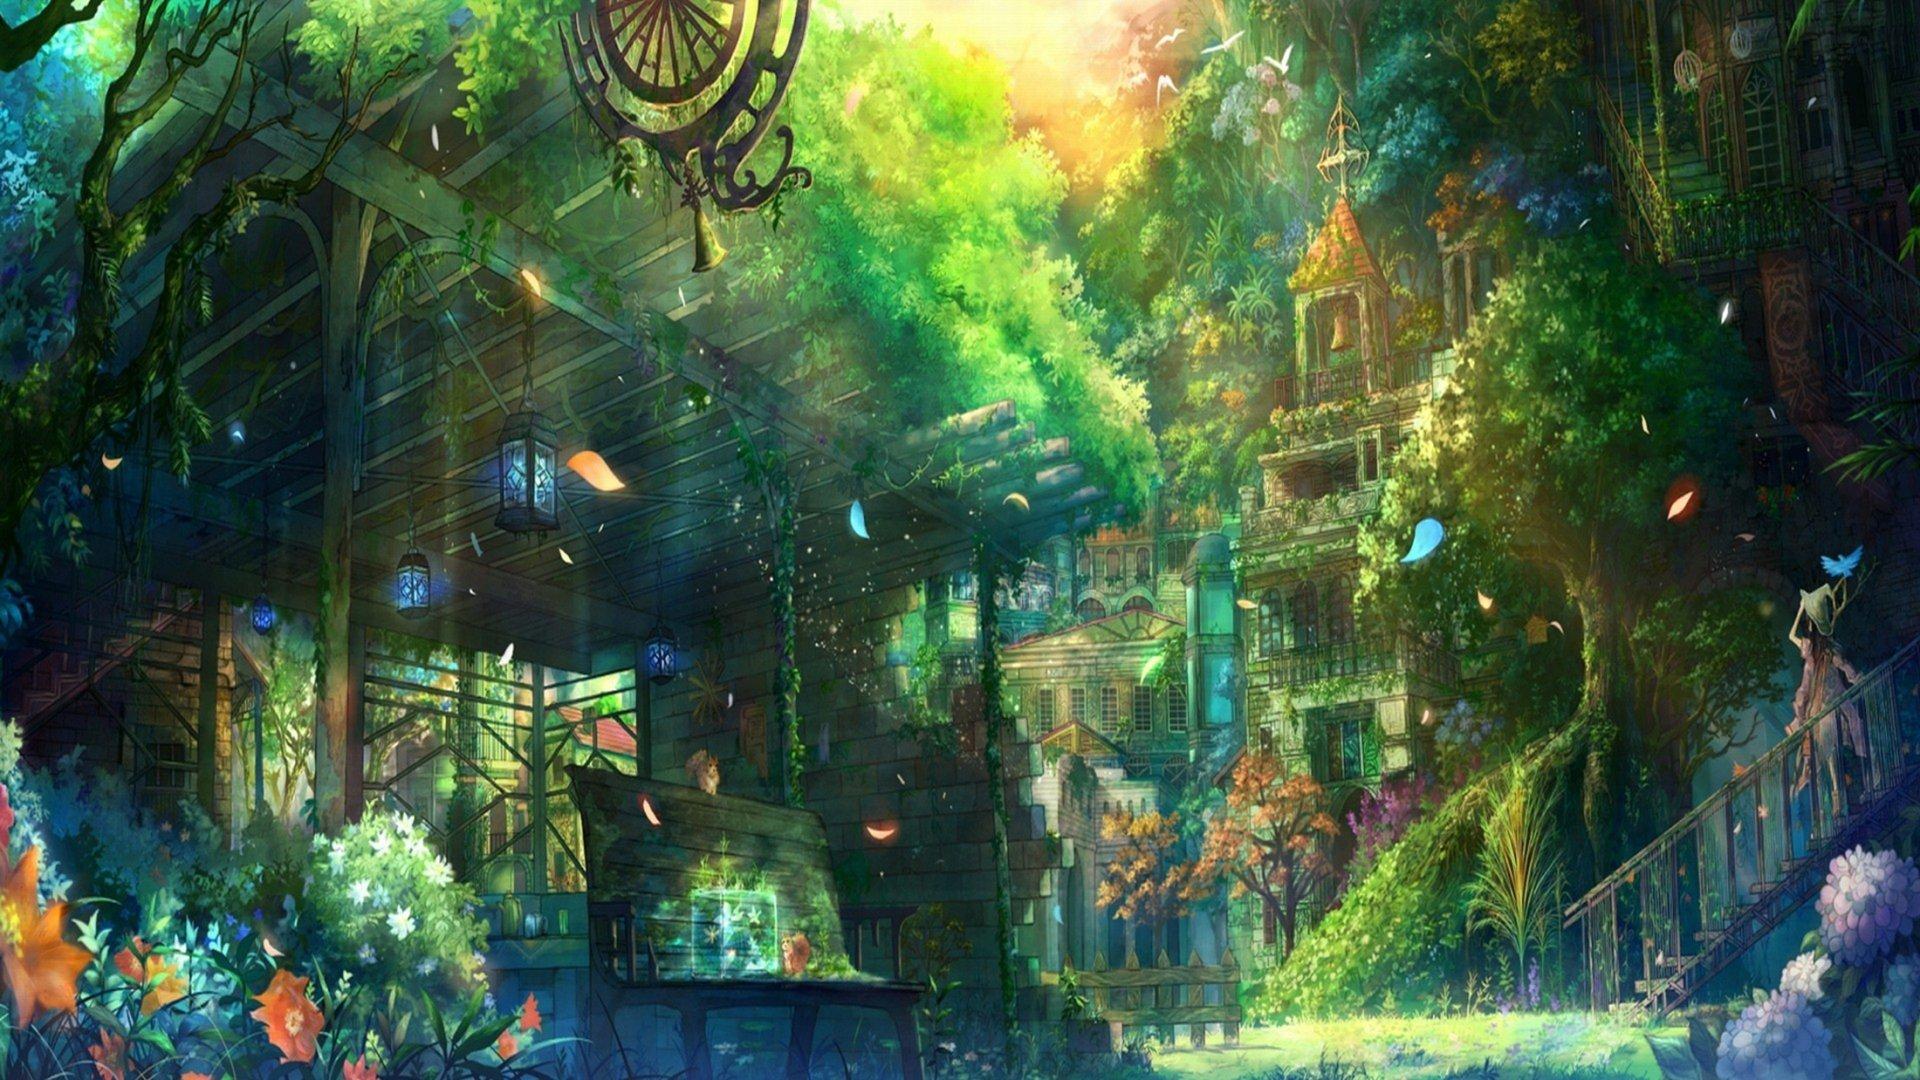 Ninja Fantasy Girl Wallpaper Beautiful Landscape Hd Wallpaper Background Image